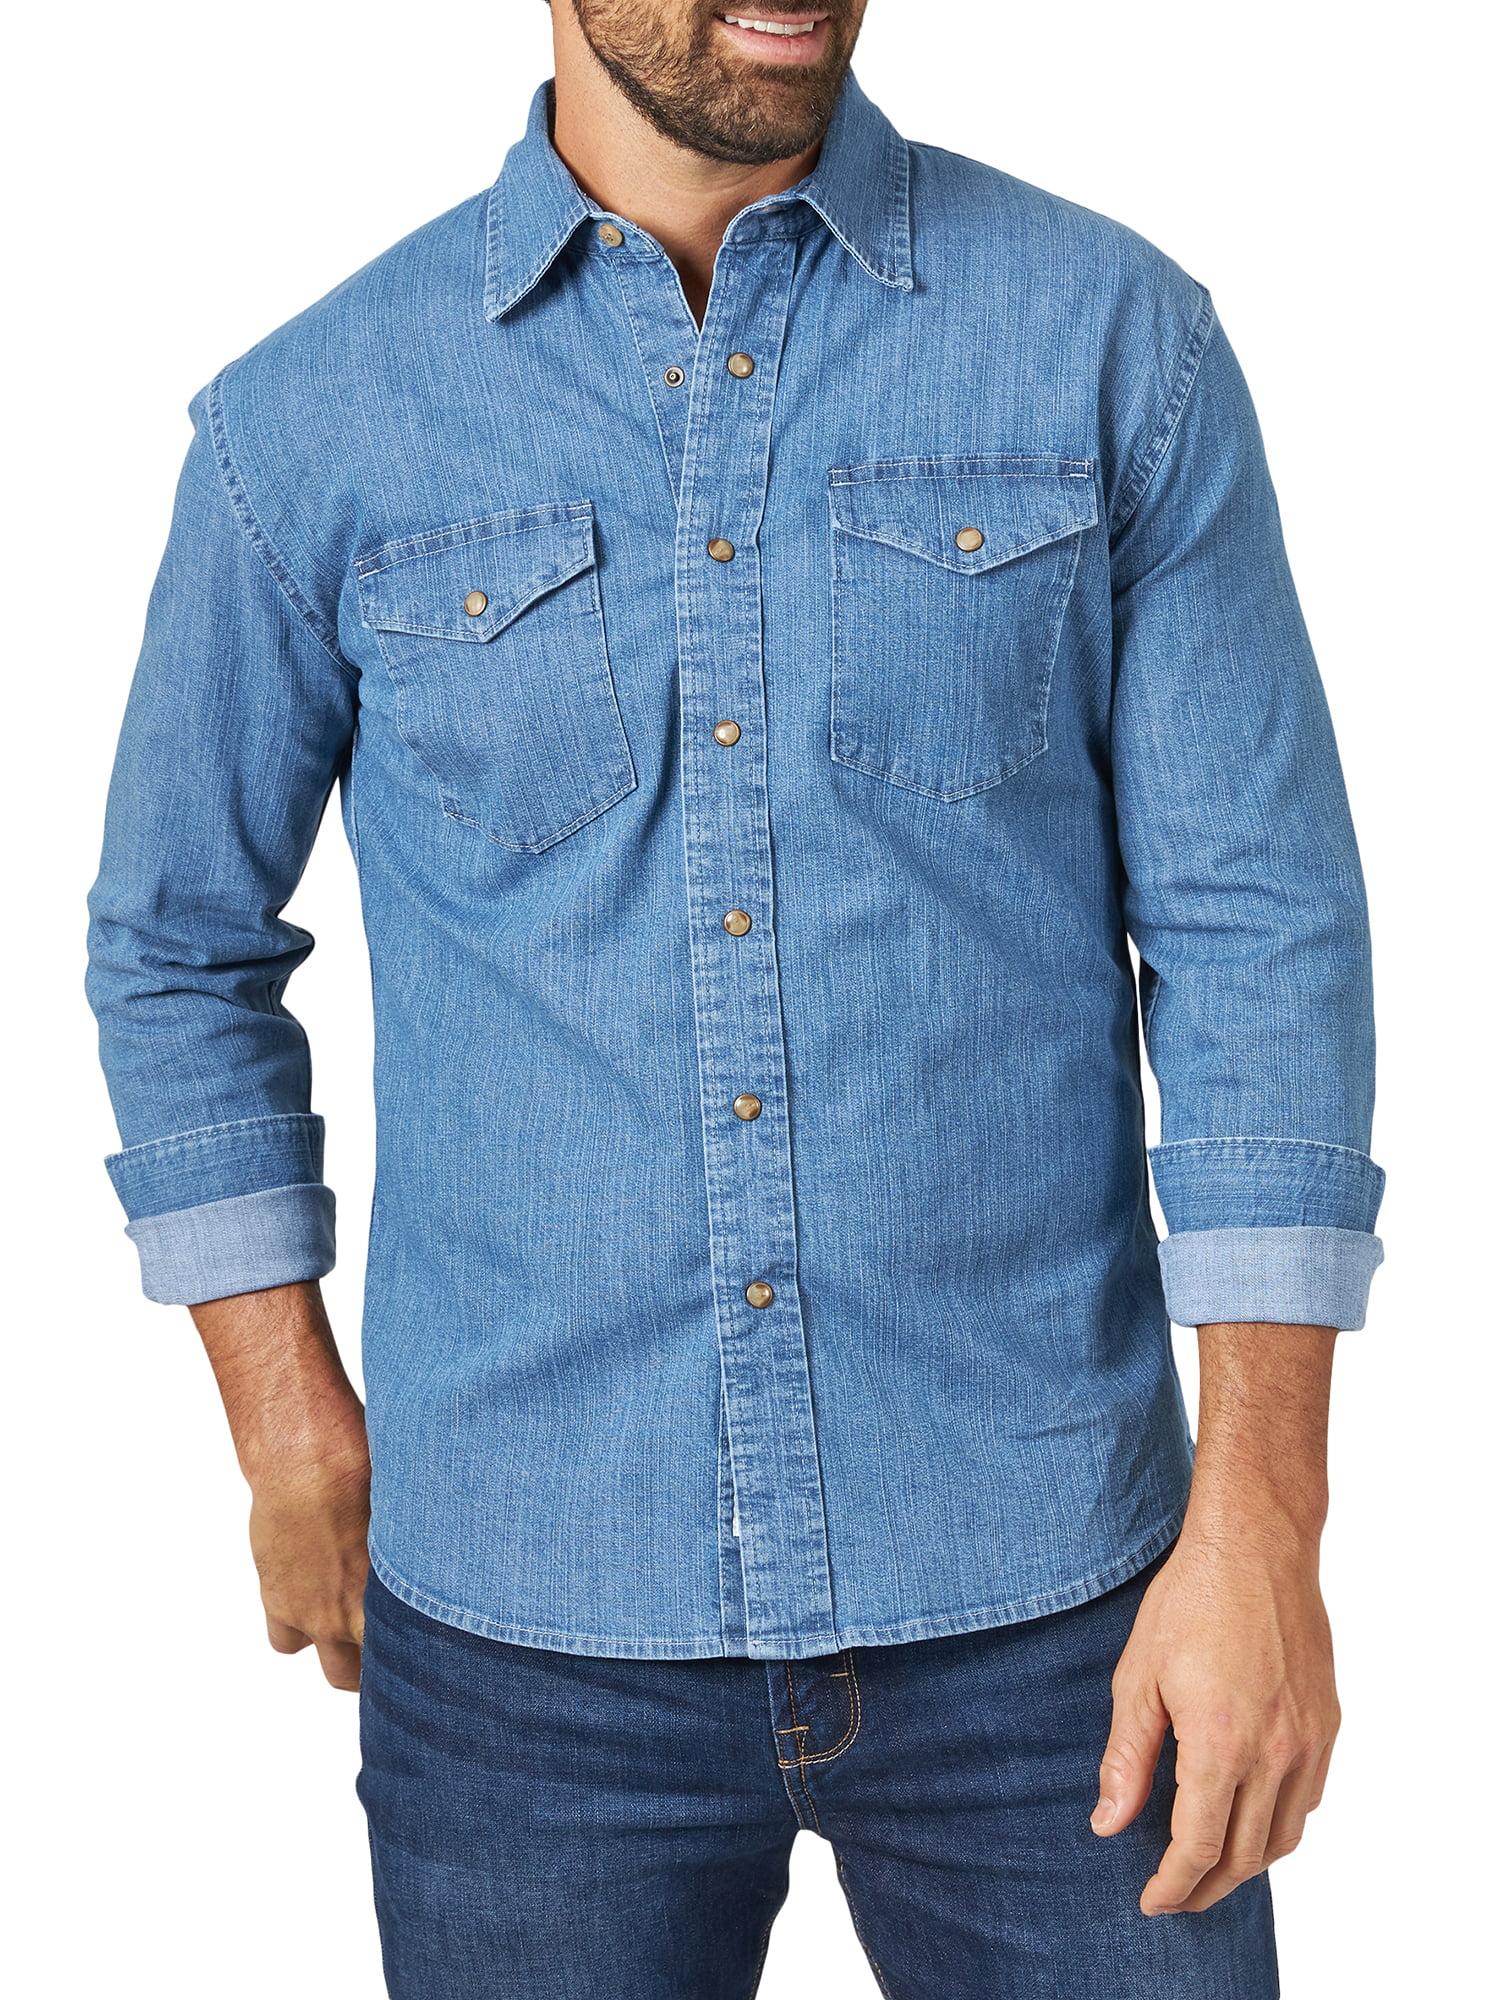 Slim Fit Outdoor Denim Chambray Button Down Shirt